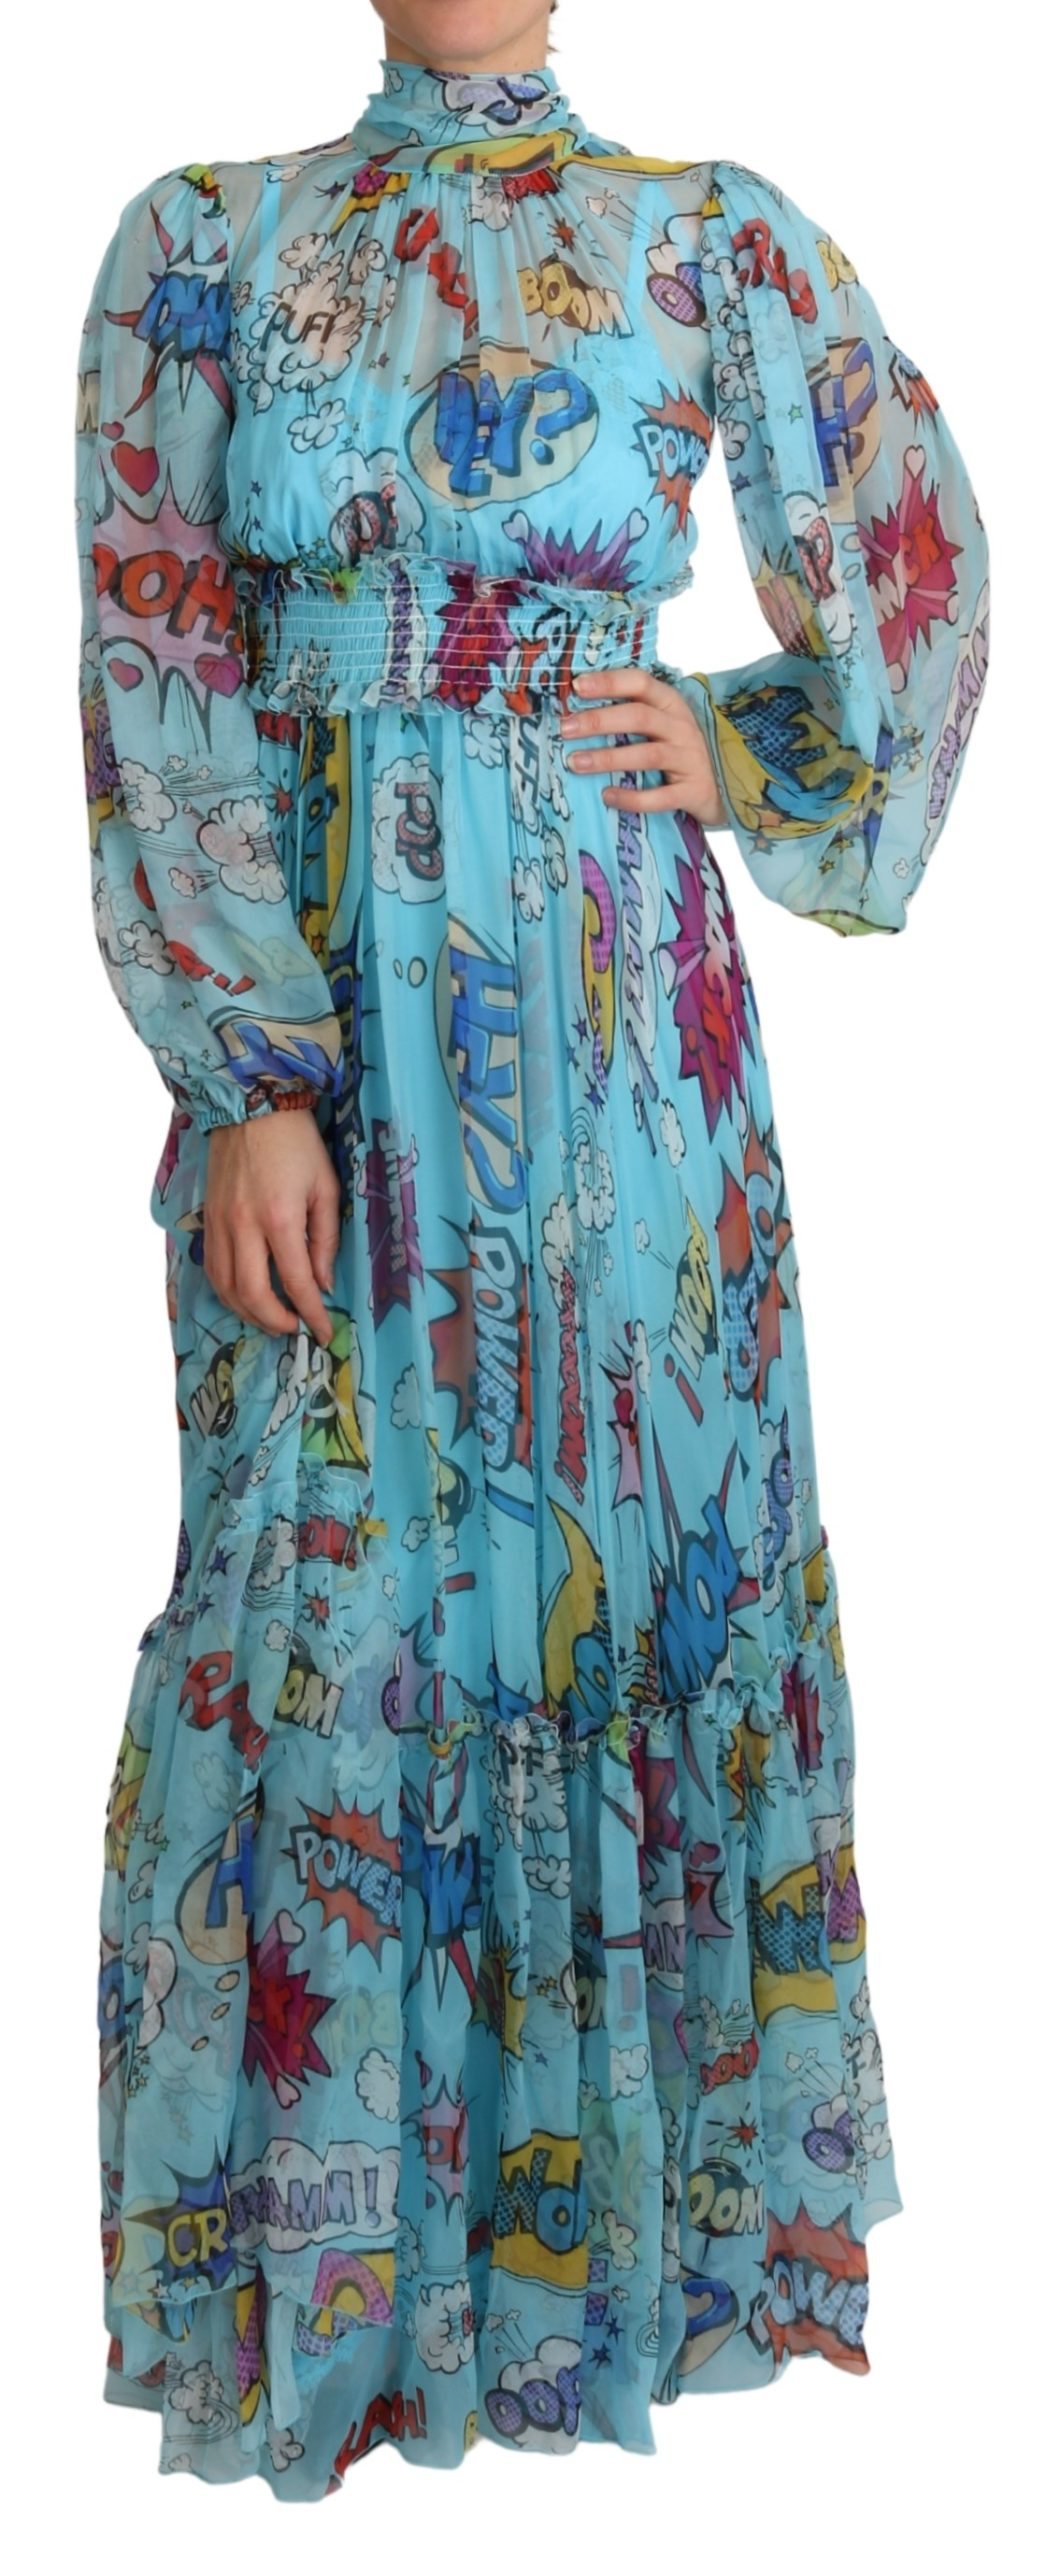 Dolce & Gabbana Women's Cartoon Print Pleated Dress Blue DR2573 - IT38|XS